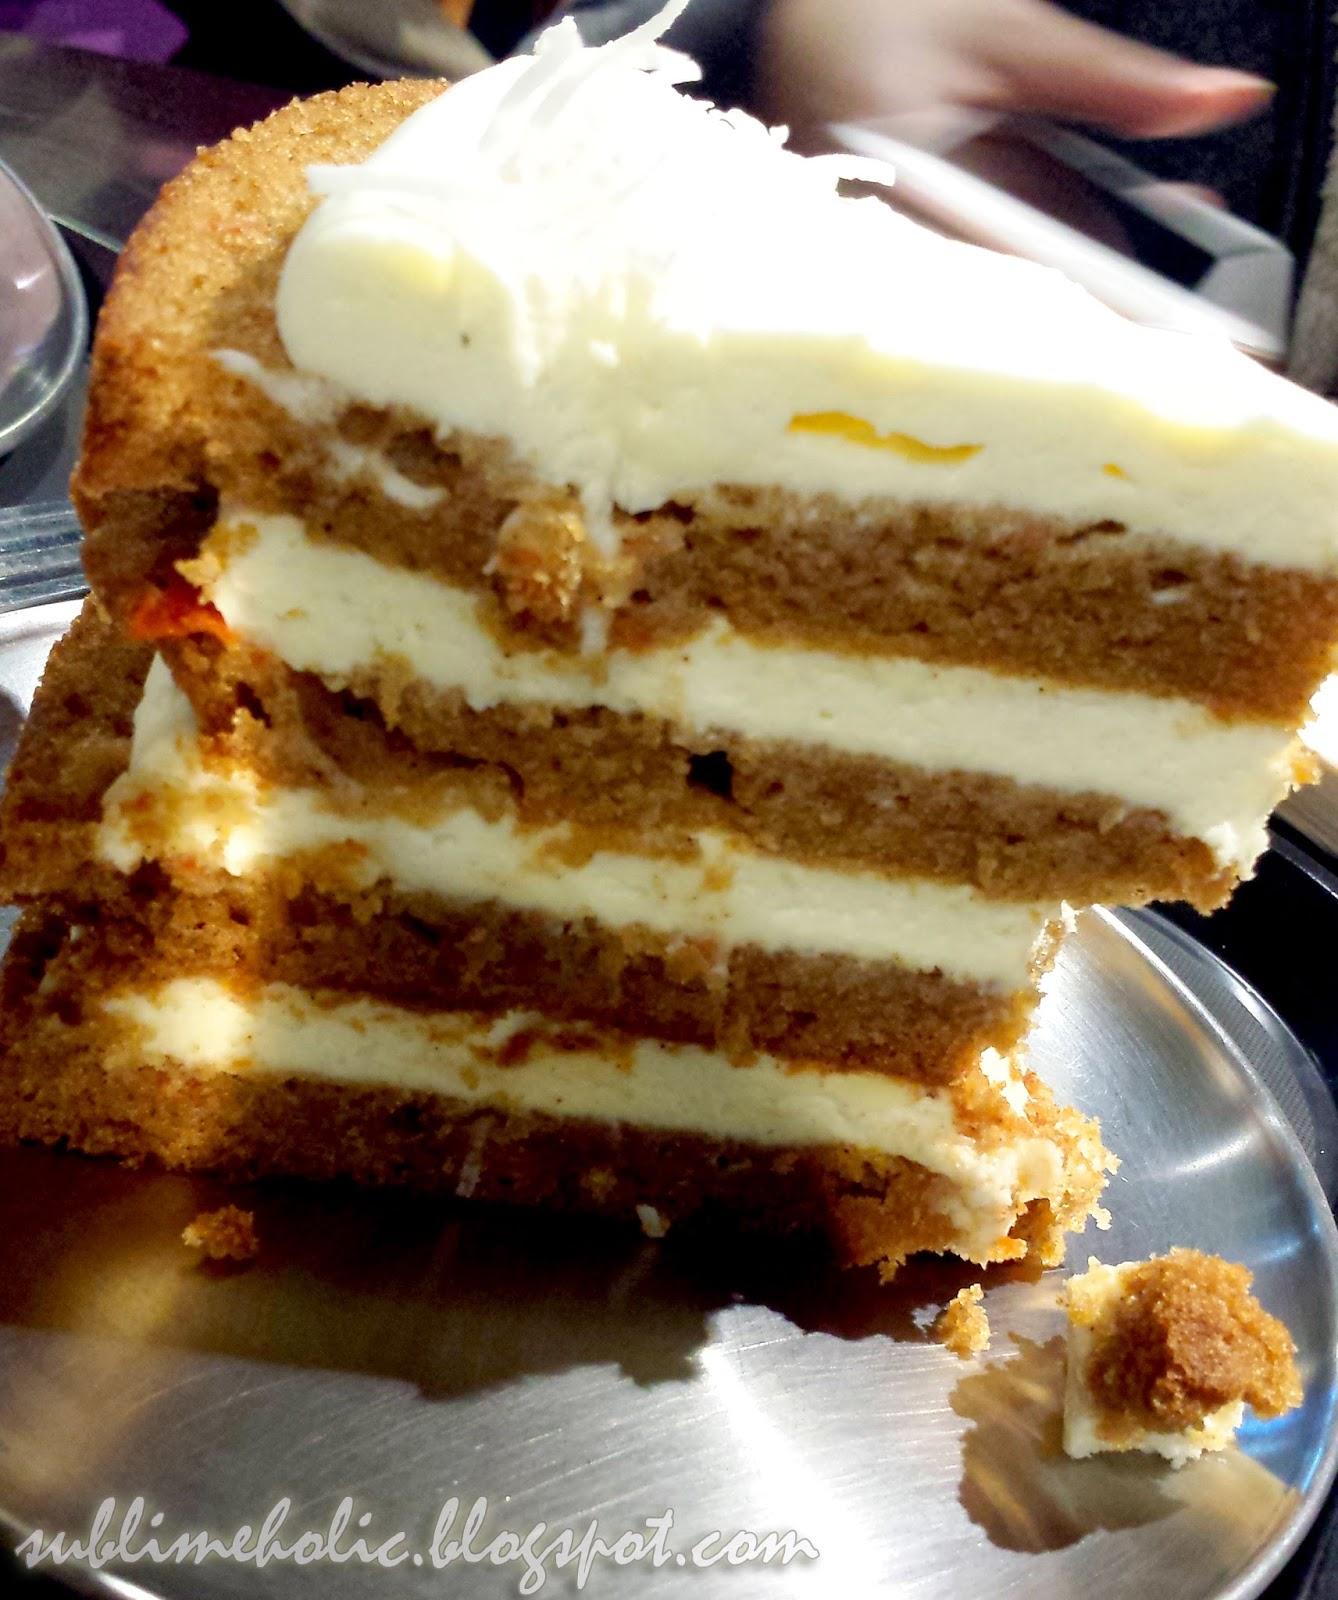 Slice Carrot Cake Calories